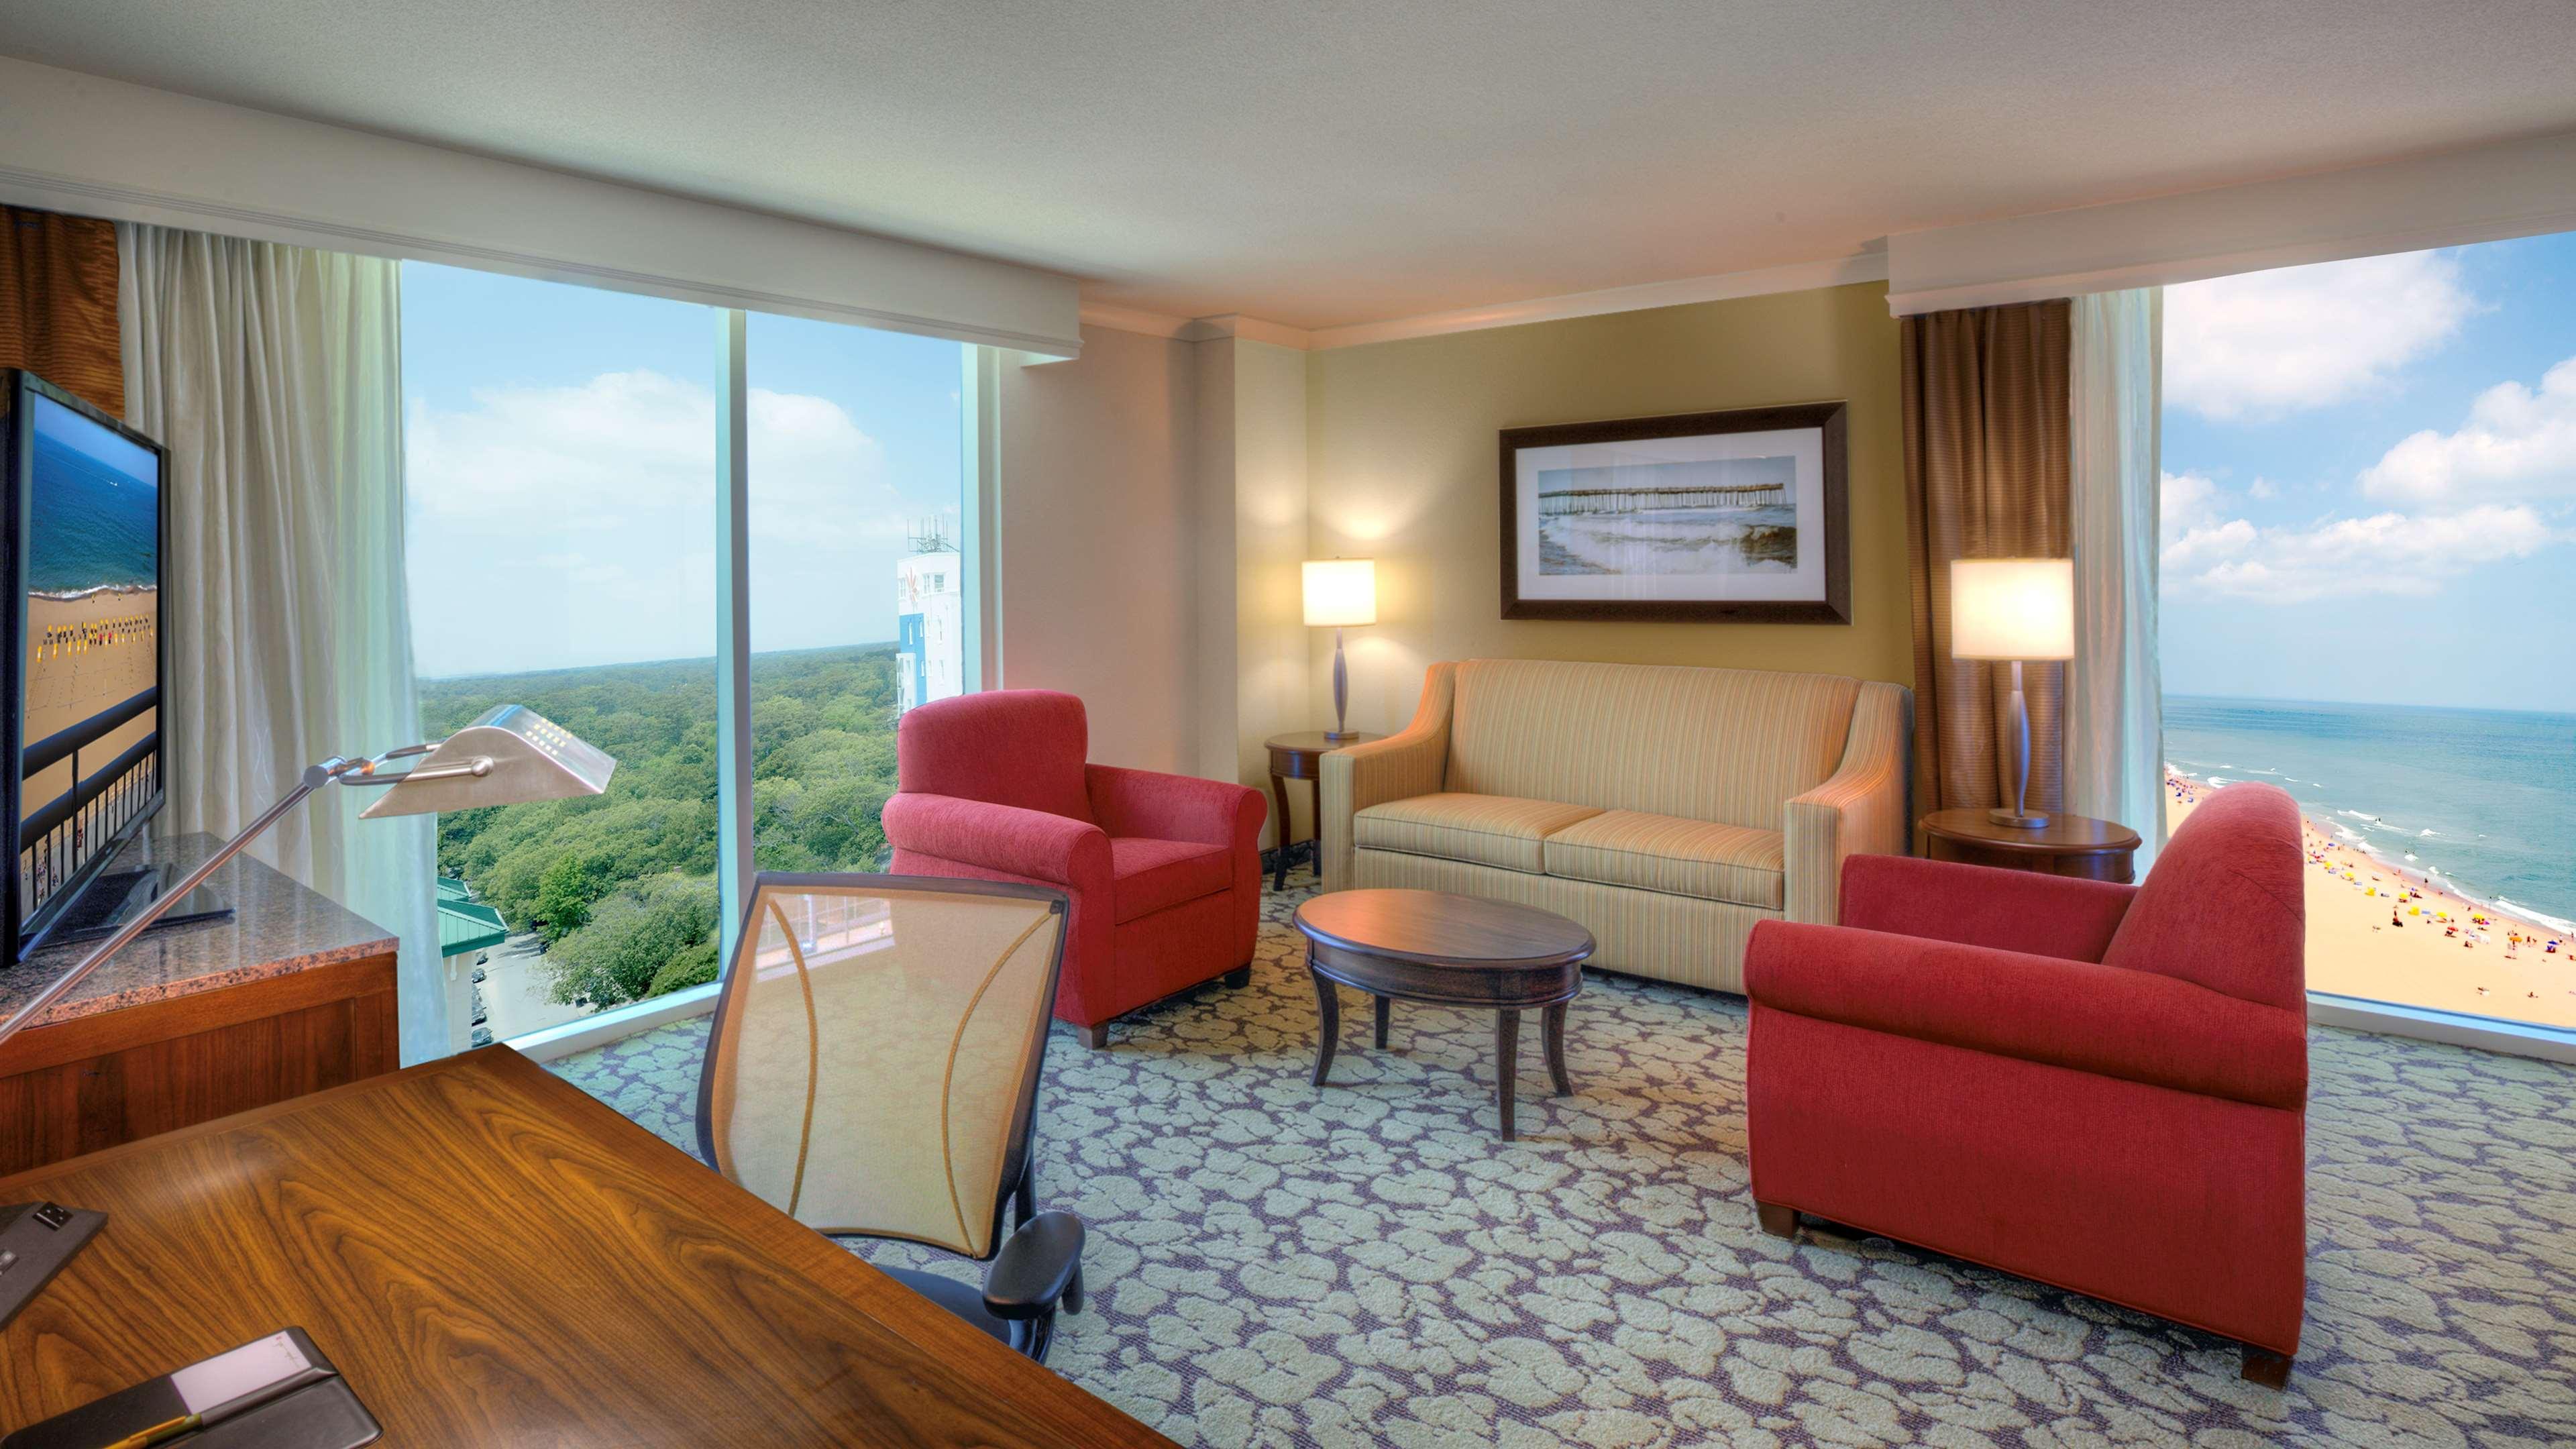 Hilton Garden Inn Virginia Beach Oceanfront image 21